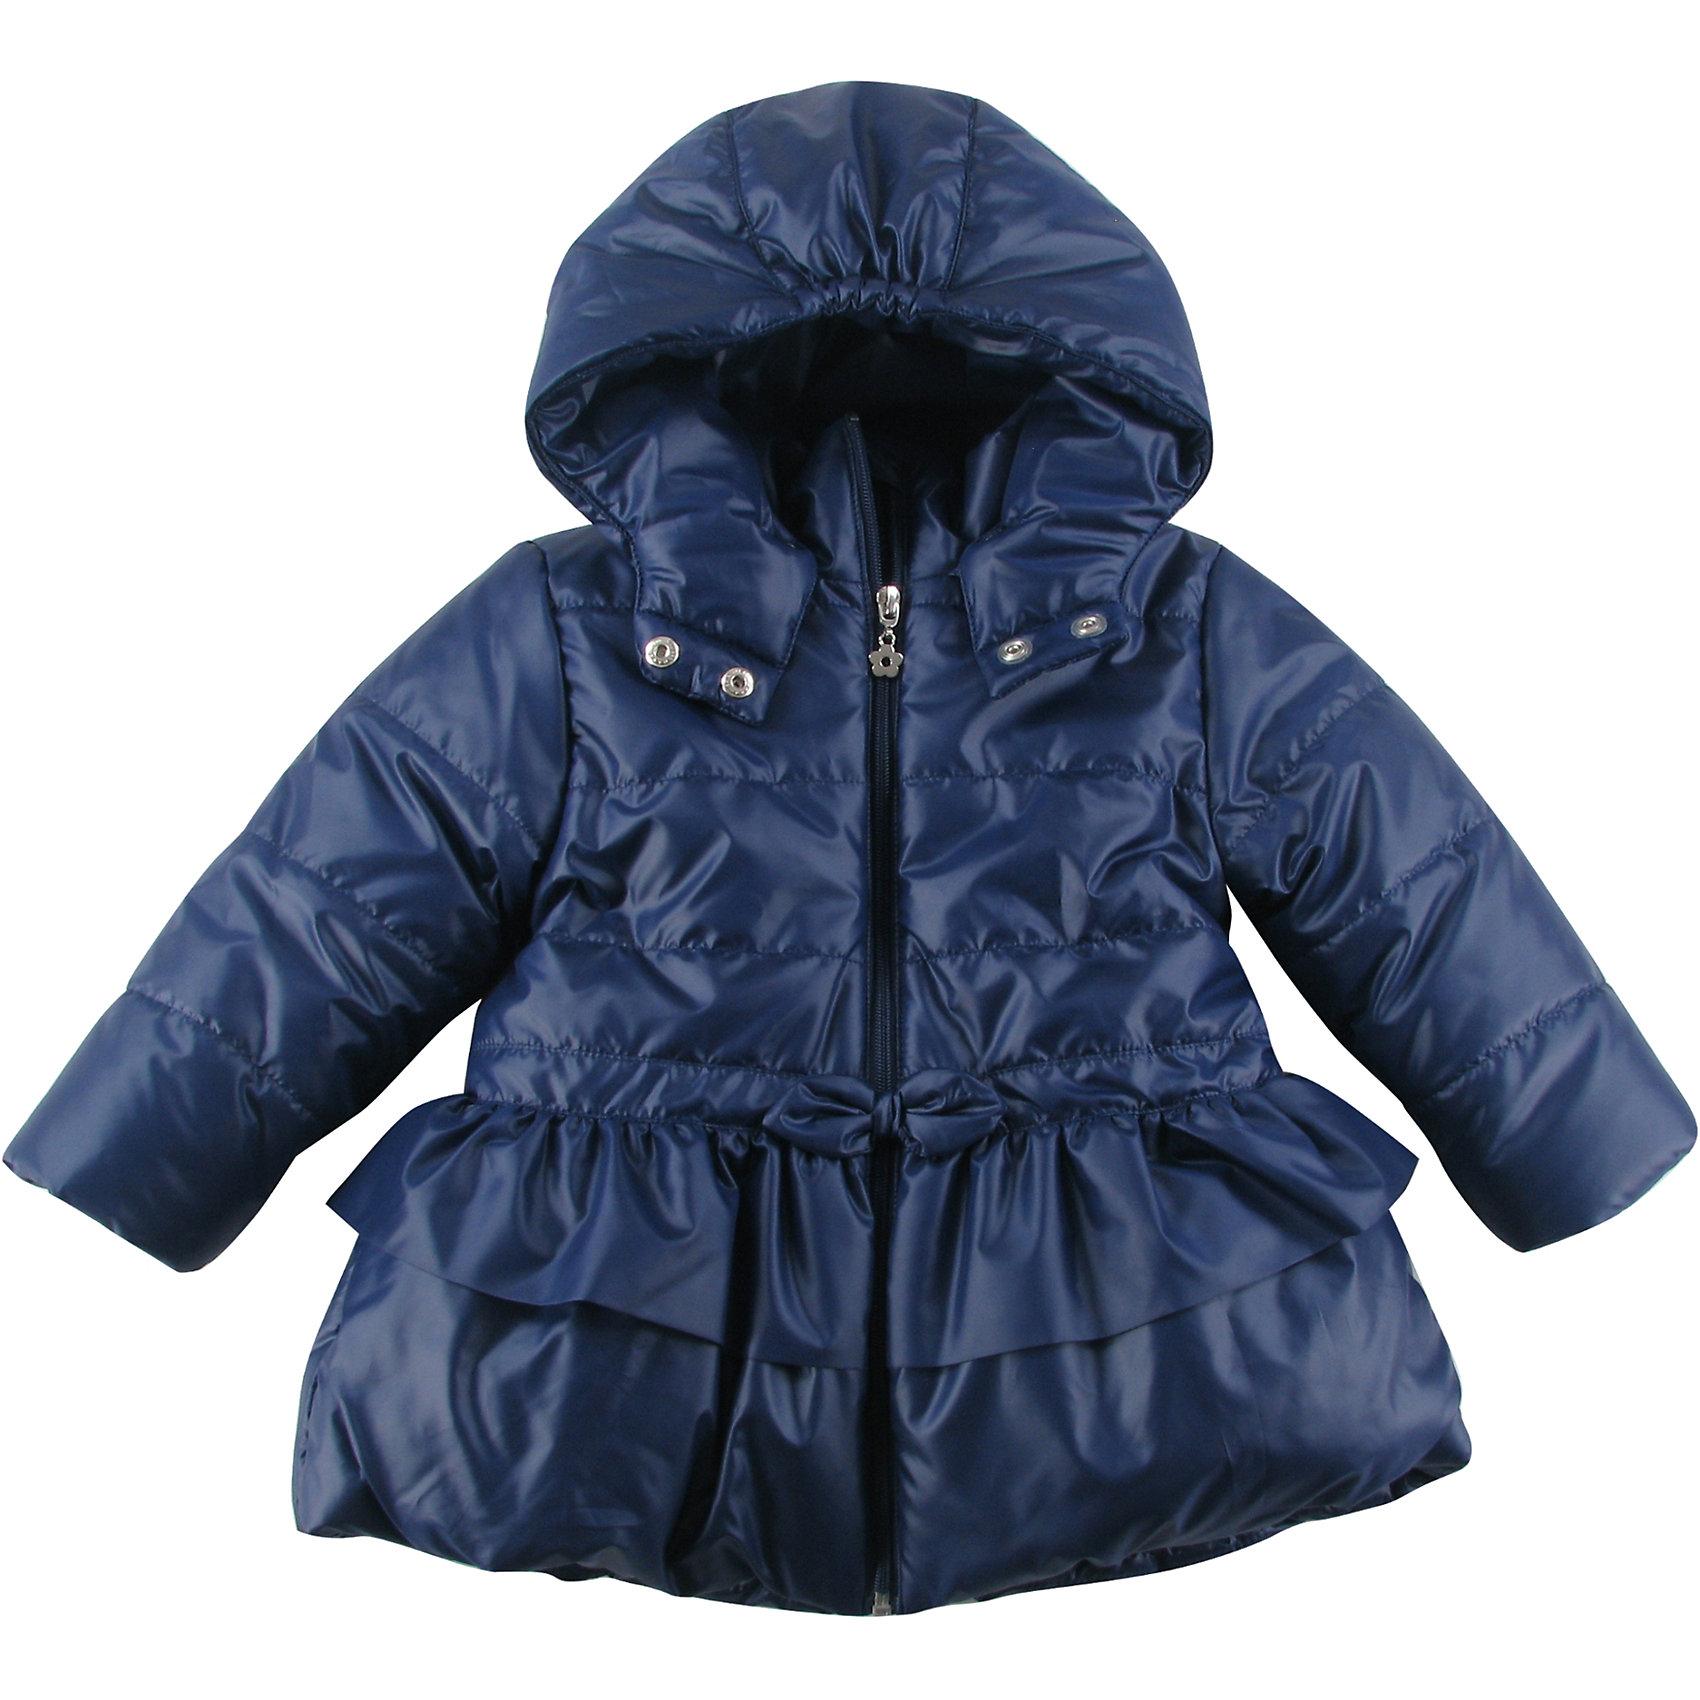 Куртка утепленная для девочки WojcikВерхняя одежда<br>Куртка утепленная для девочки Wojcik<br>Состав:<br>Полиэстер 100%<br><br>Ширина мм: 356<br>Глубина мм: 10<br>Высота мм: 245<br>Вес г: 519<br>Цвет: темно-синий<br>Возраст от месяцев: 6<br>Возраст до месяцев: 9<br>Пол: Женский<br>Возраст: Детский<br>Размер: 80,86,92,74,98<br>SKU: 5590987